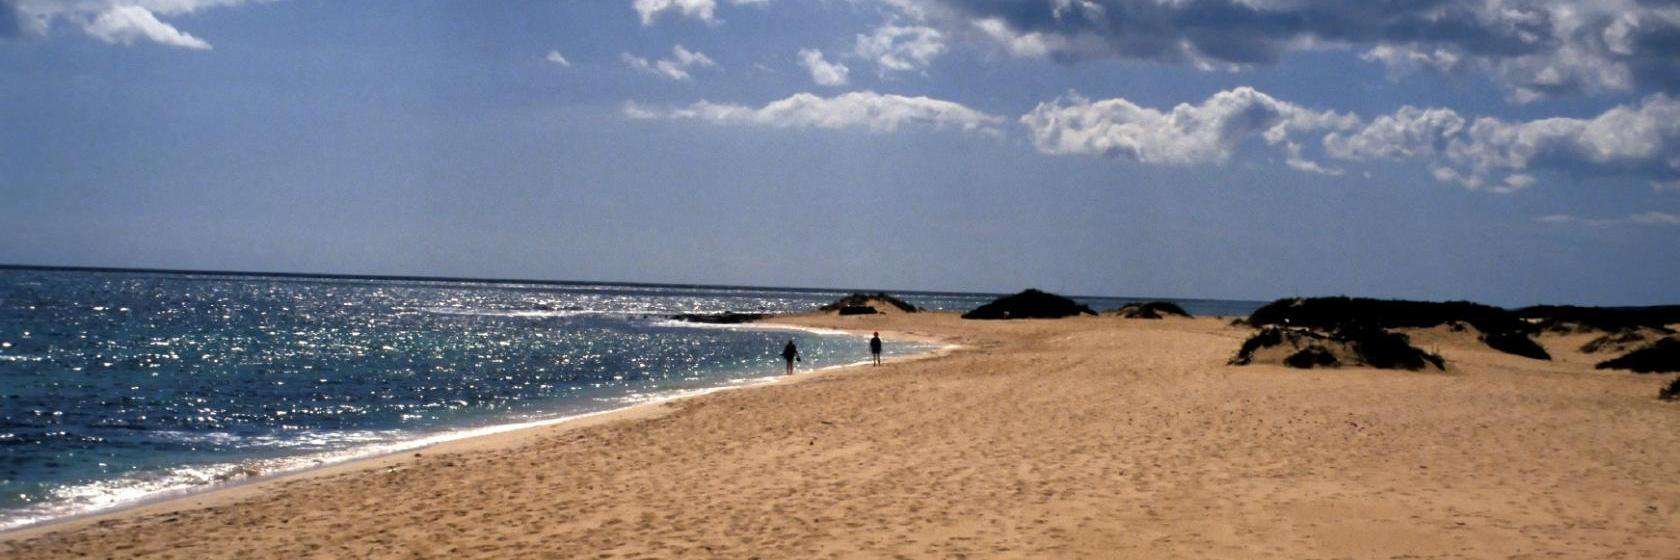 De 30 beste hotels in Morro Jable, Spanje (Prijzen vanaf € 50)